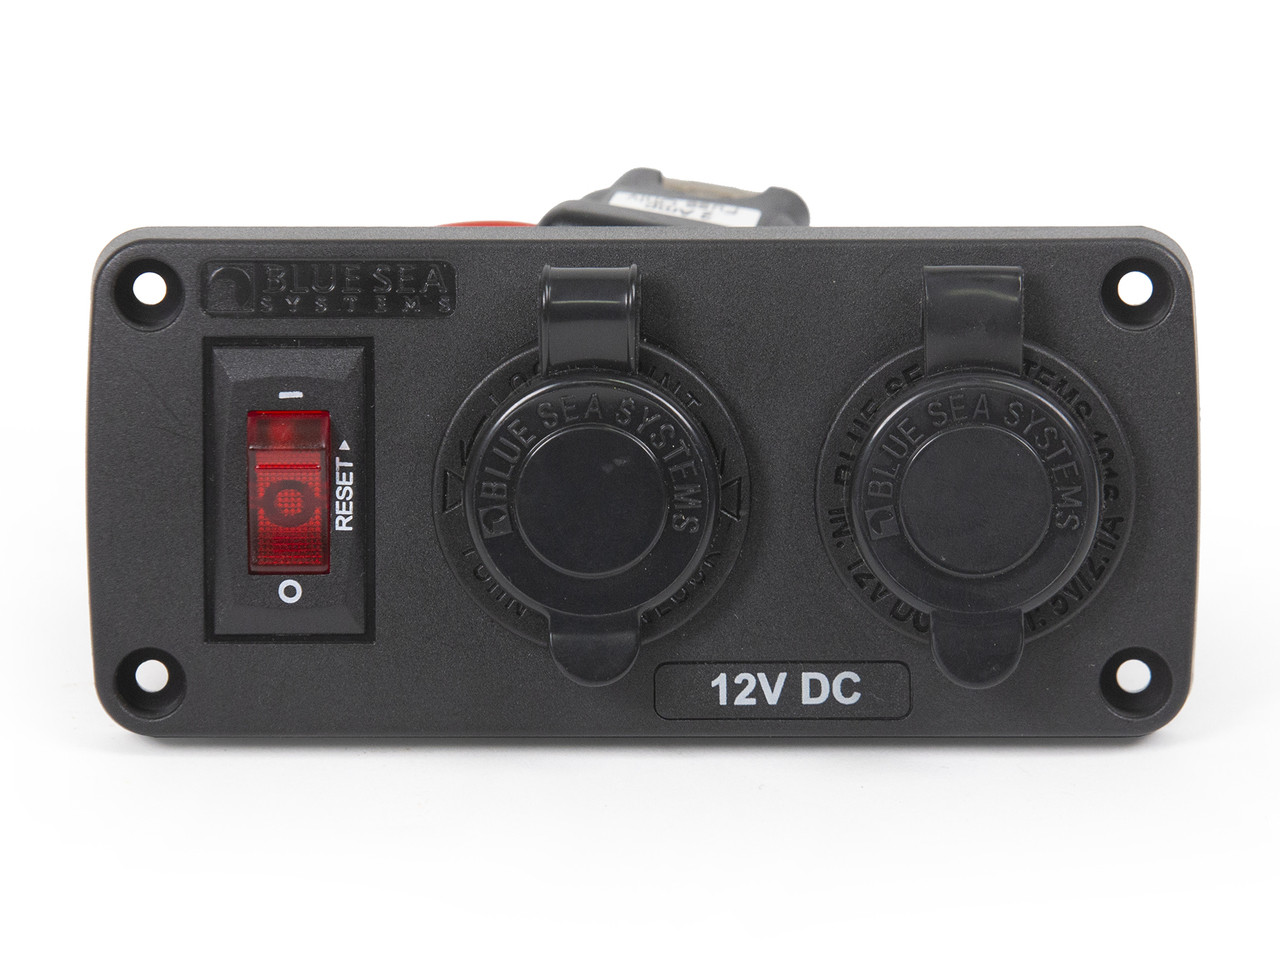 Bluesea Below Deck 12V DC & USB Power Panel